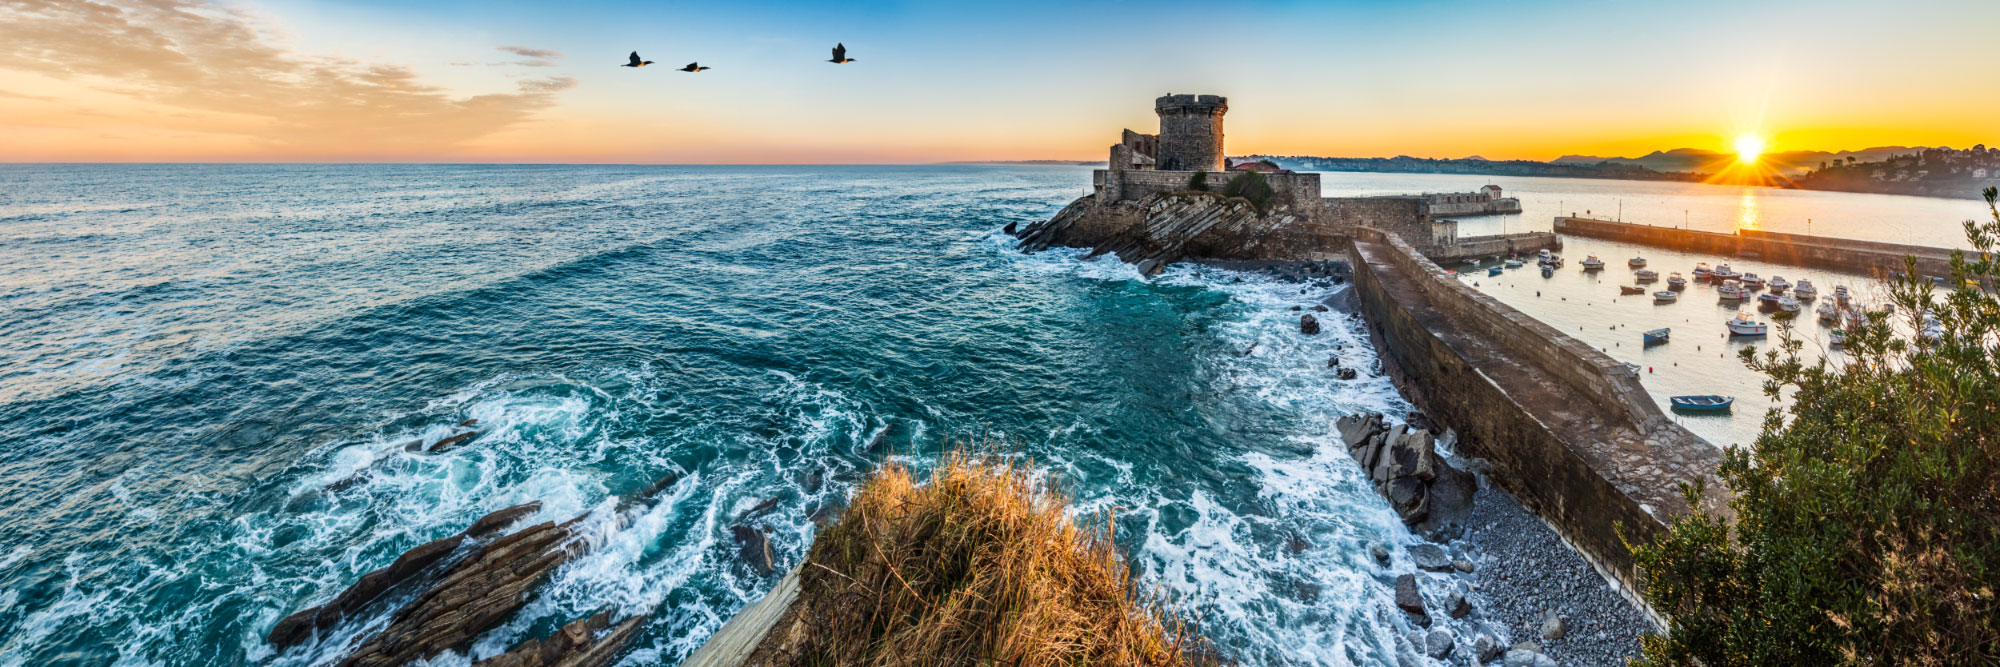 Fort (Vauban) de Socoa, baie de Saint-Jean-de-Luz, Pays-Basque